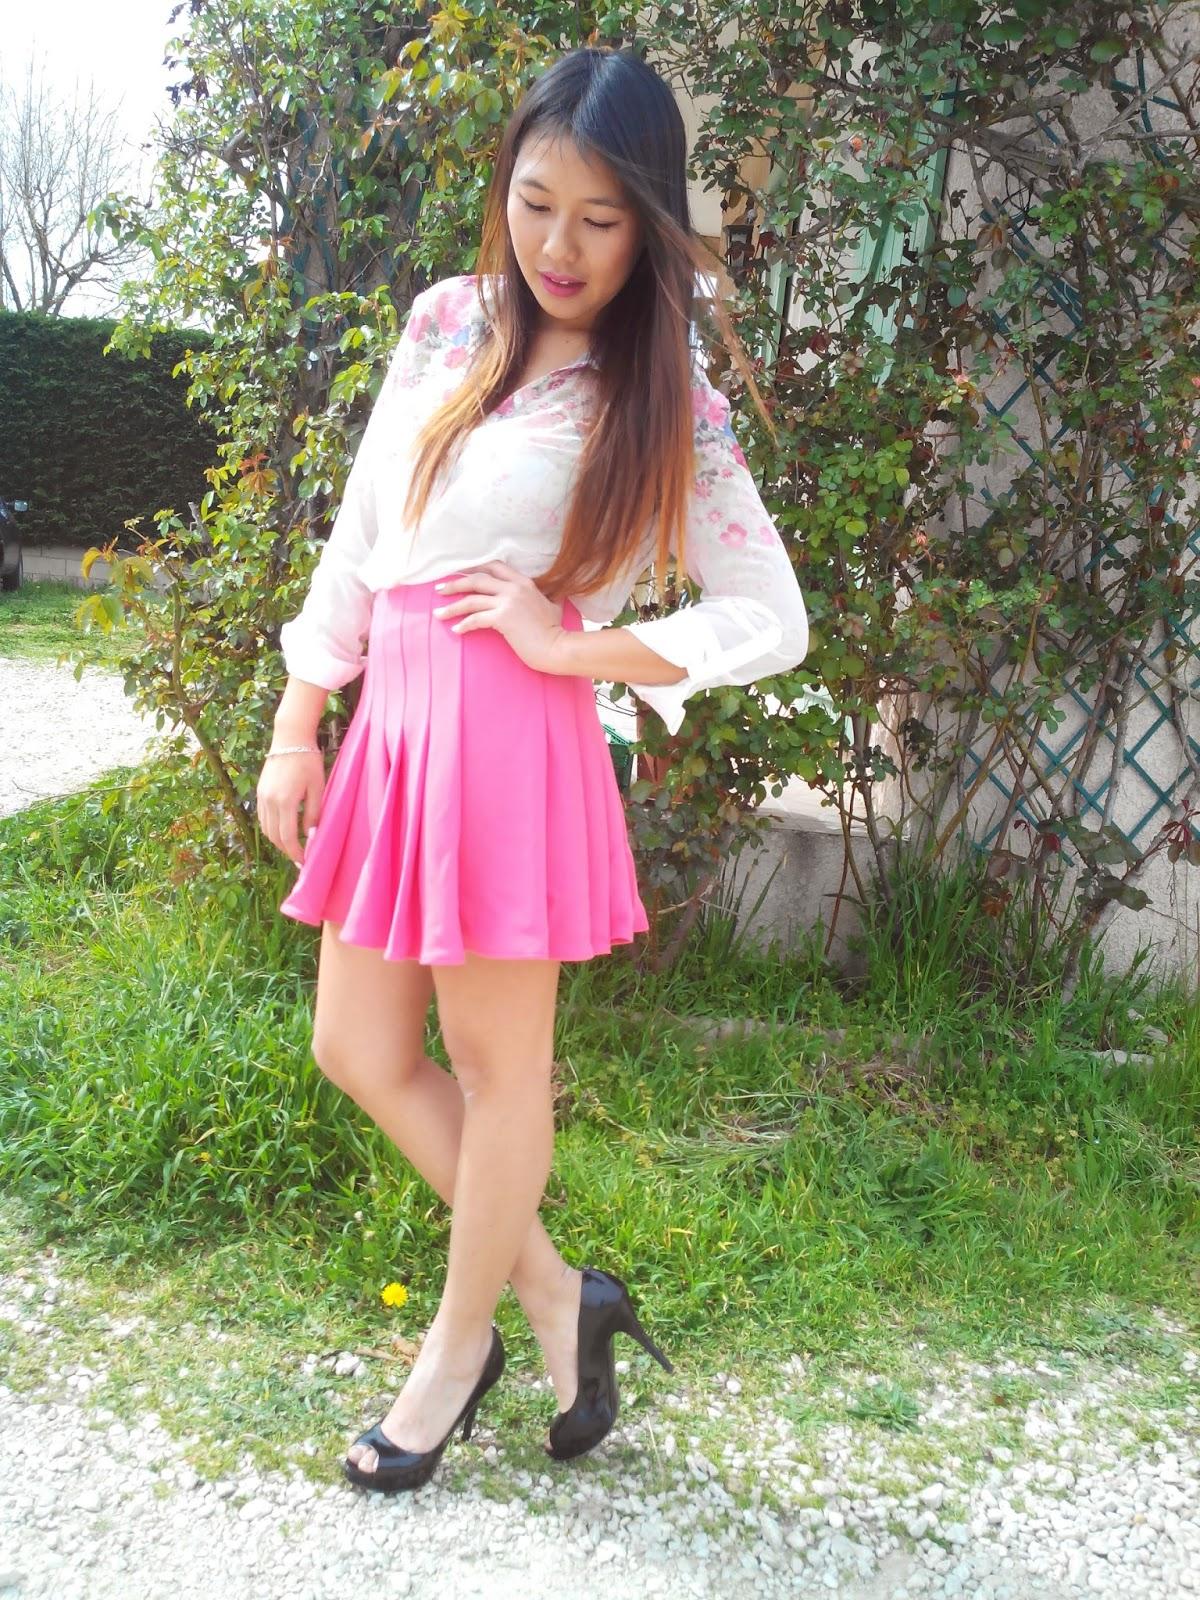 kanya's fashion look: jupe rose & chemisier à fleurs